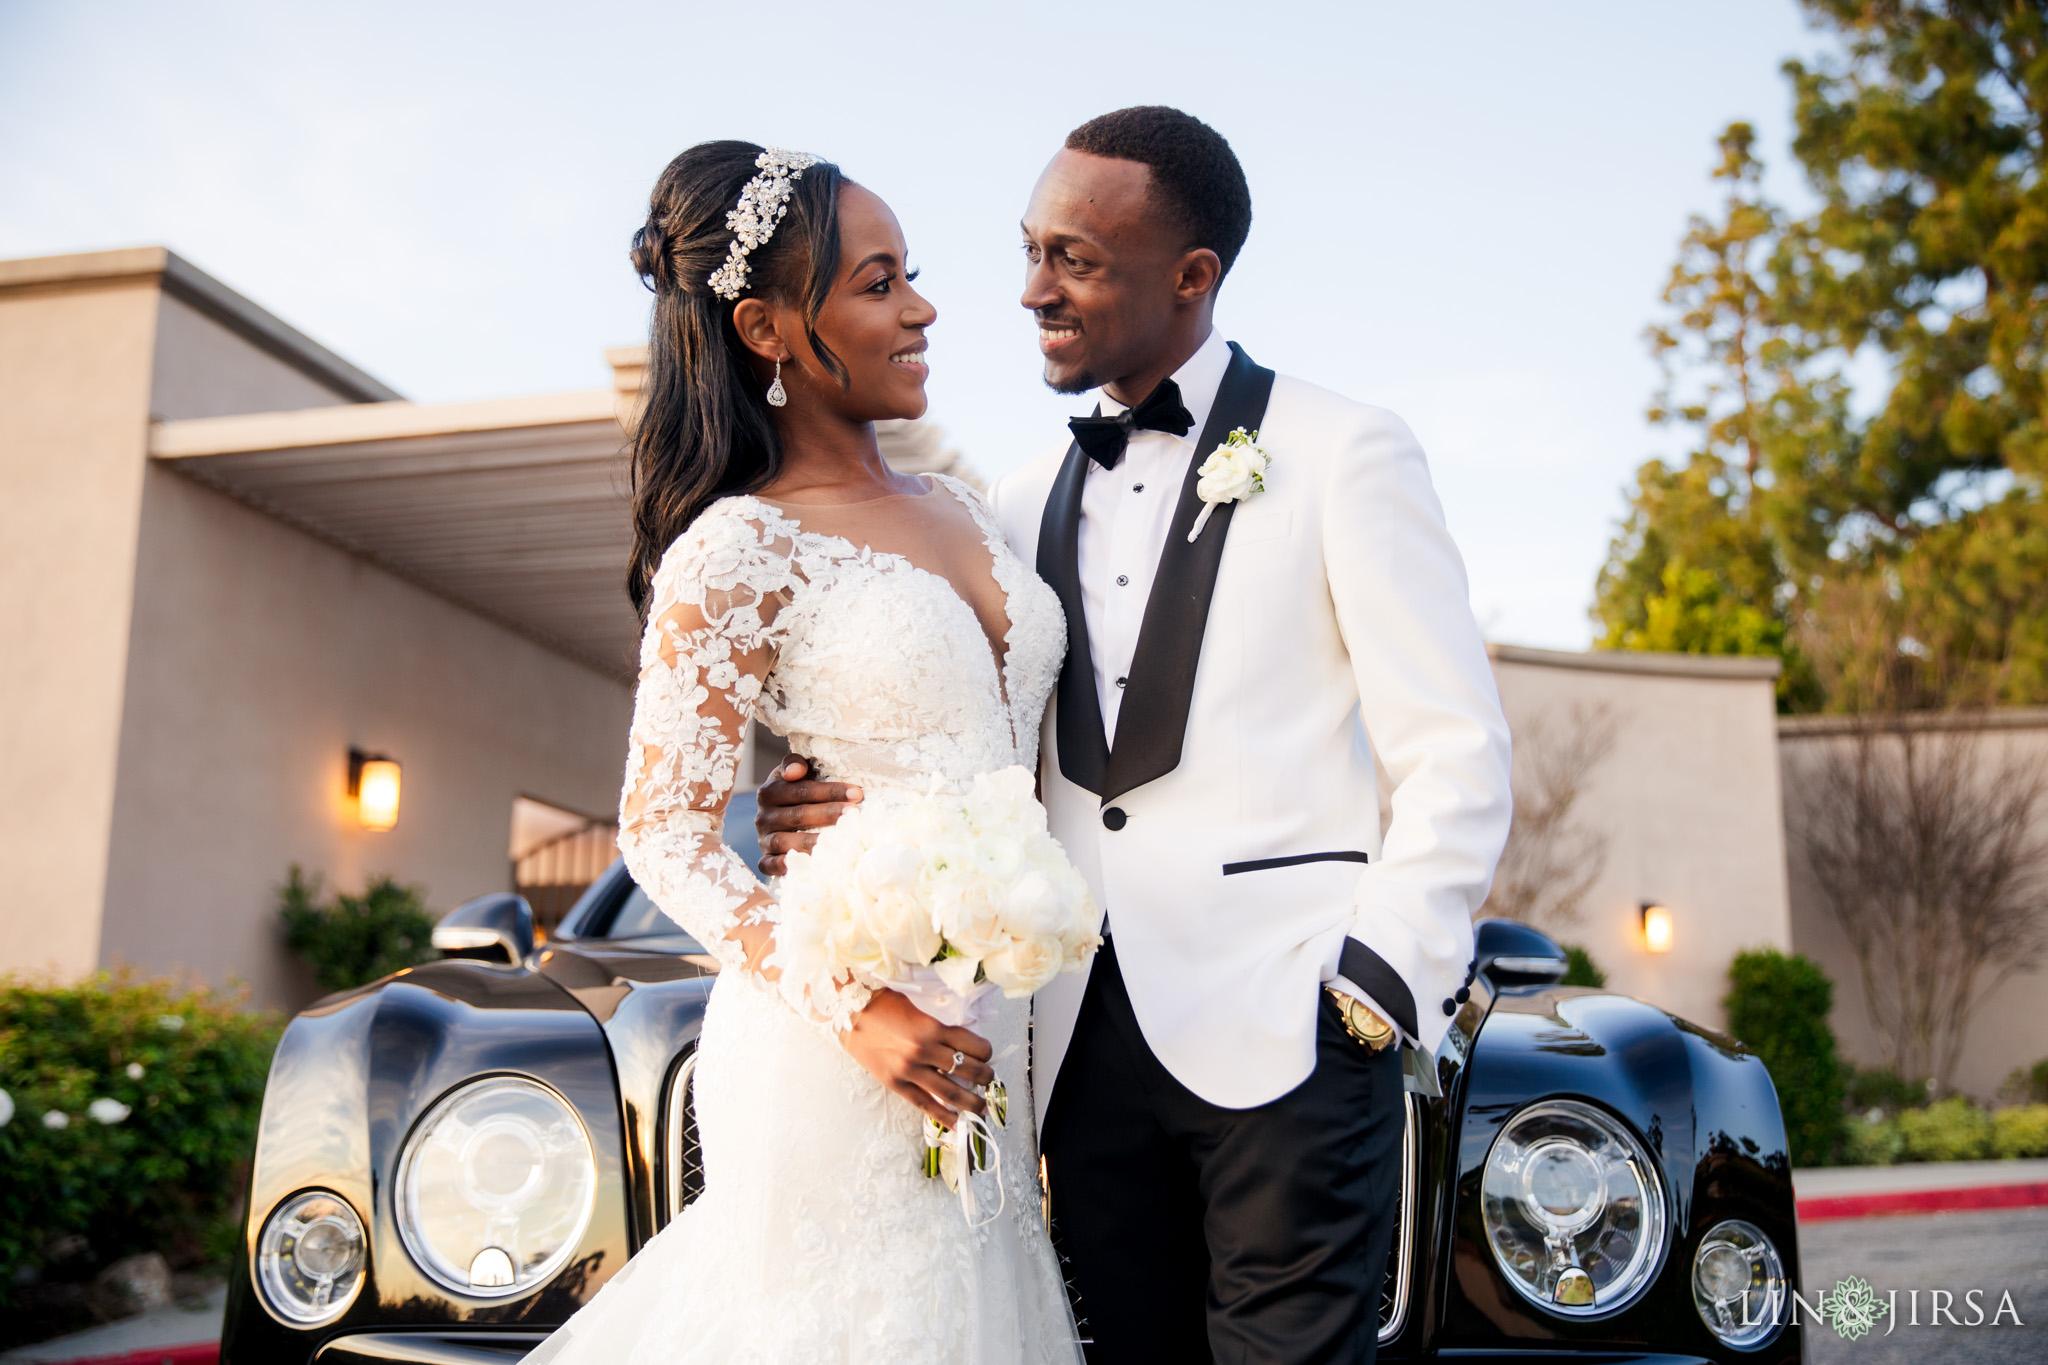 26 Los Verdes Golf Course Palos Verdes Kenyan Wedding Photography